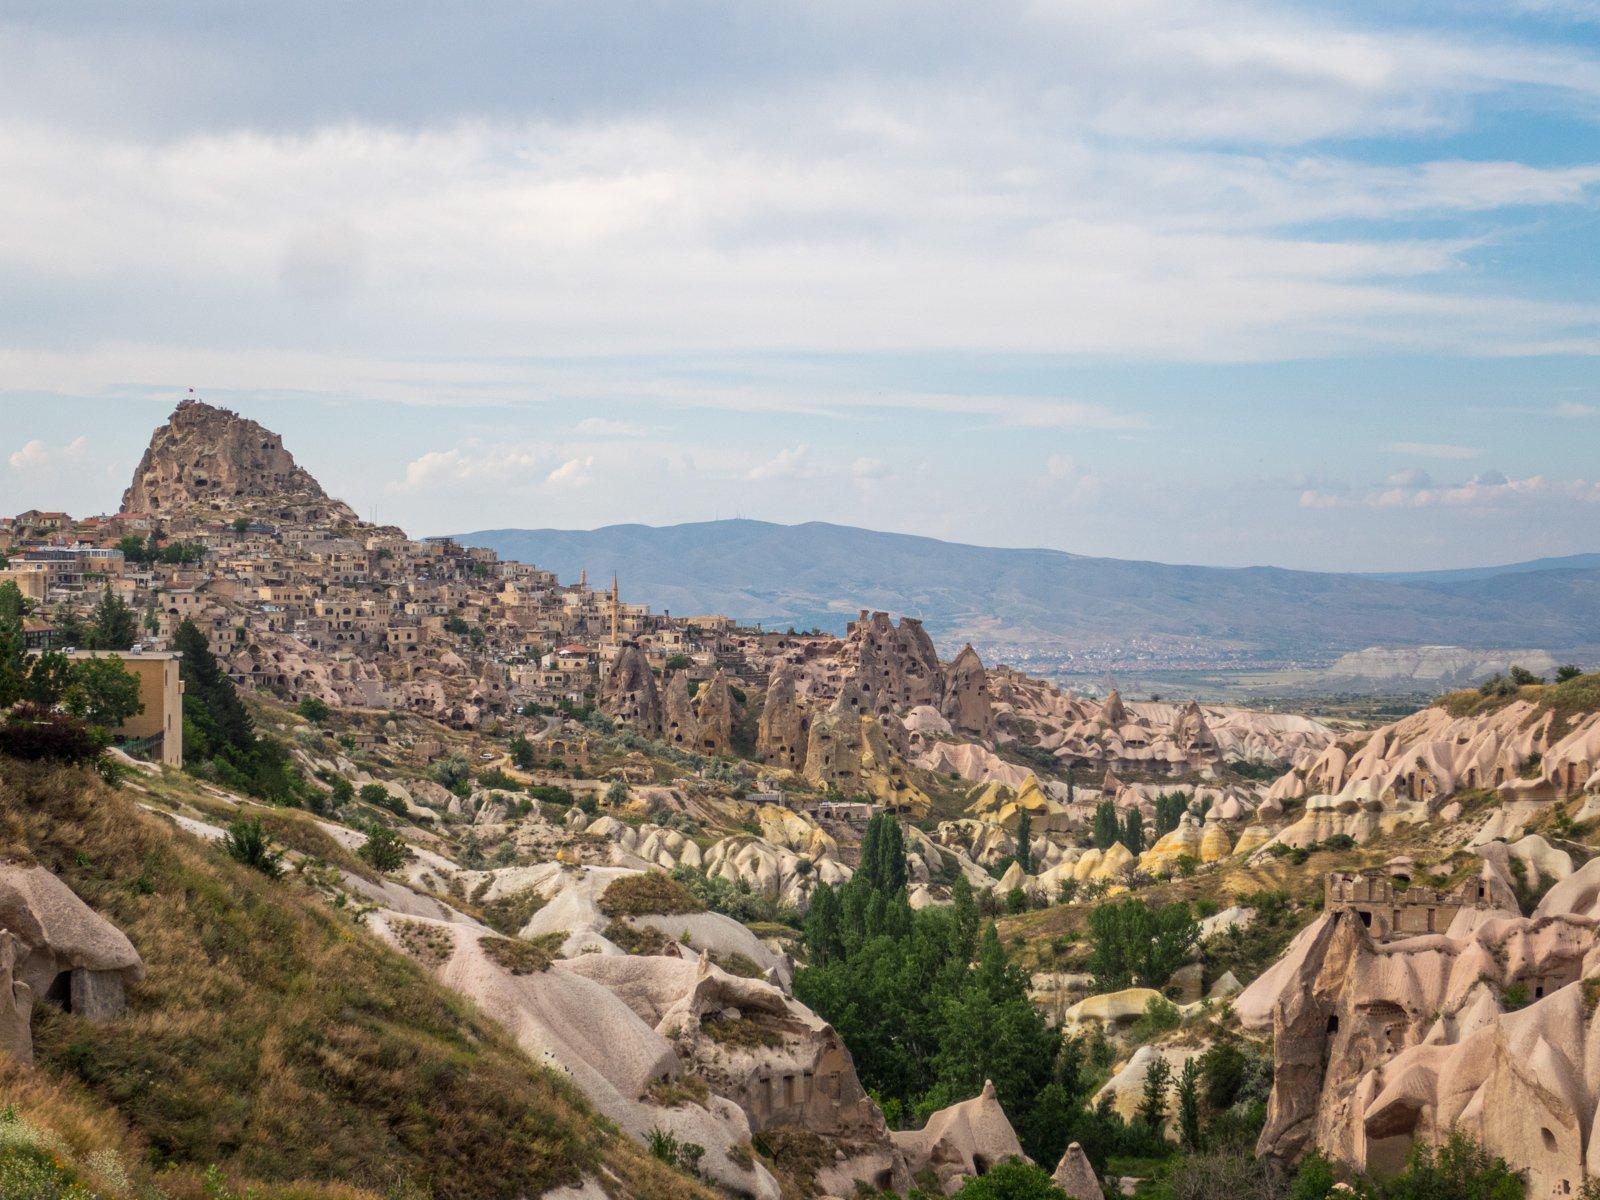 Rock castle at Uchisar (far left)